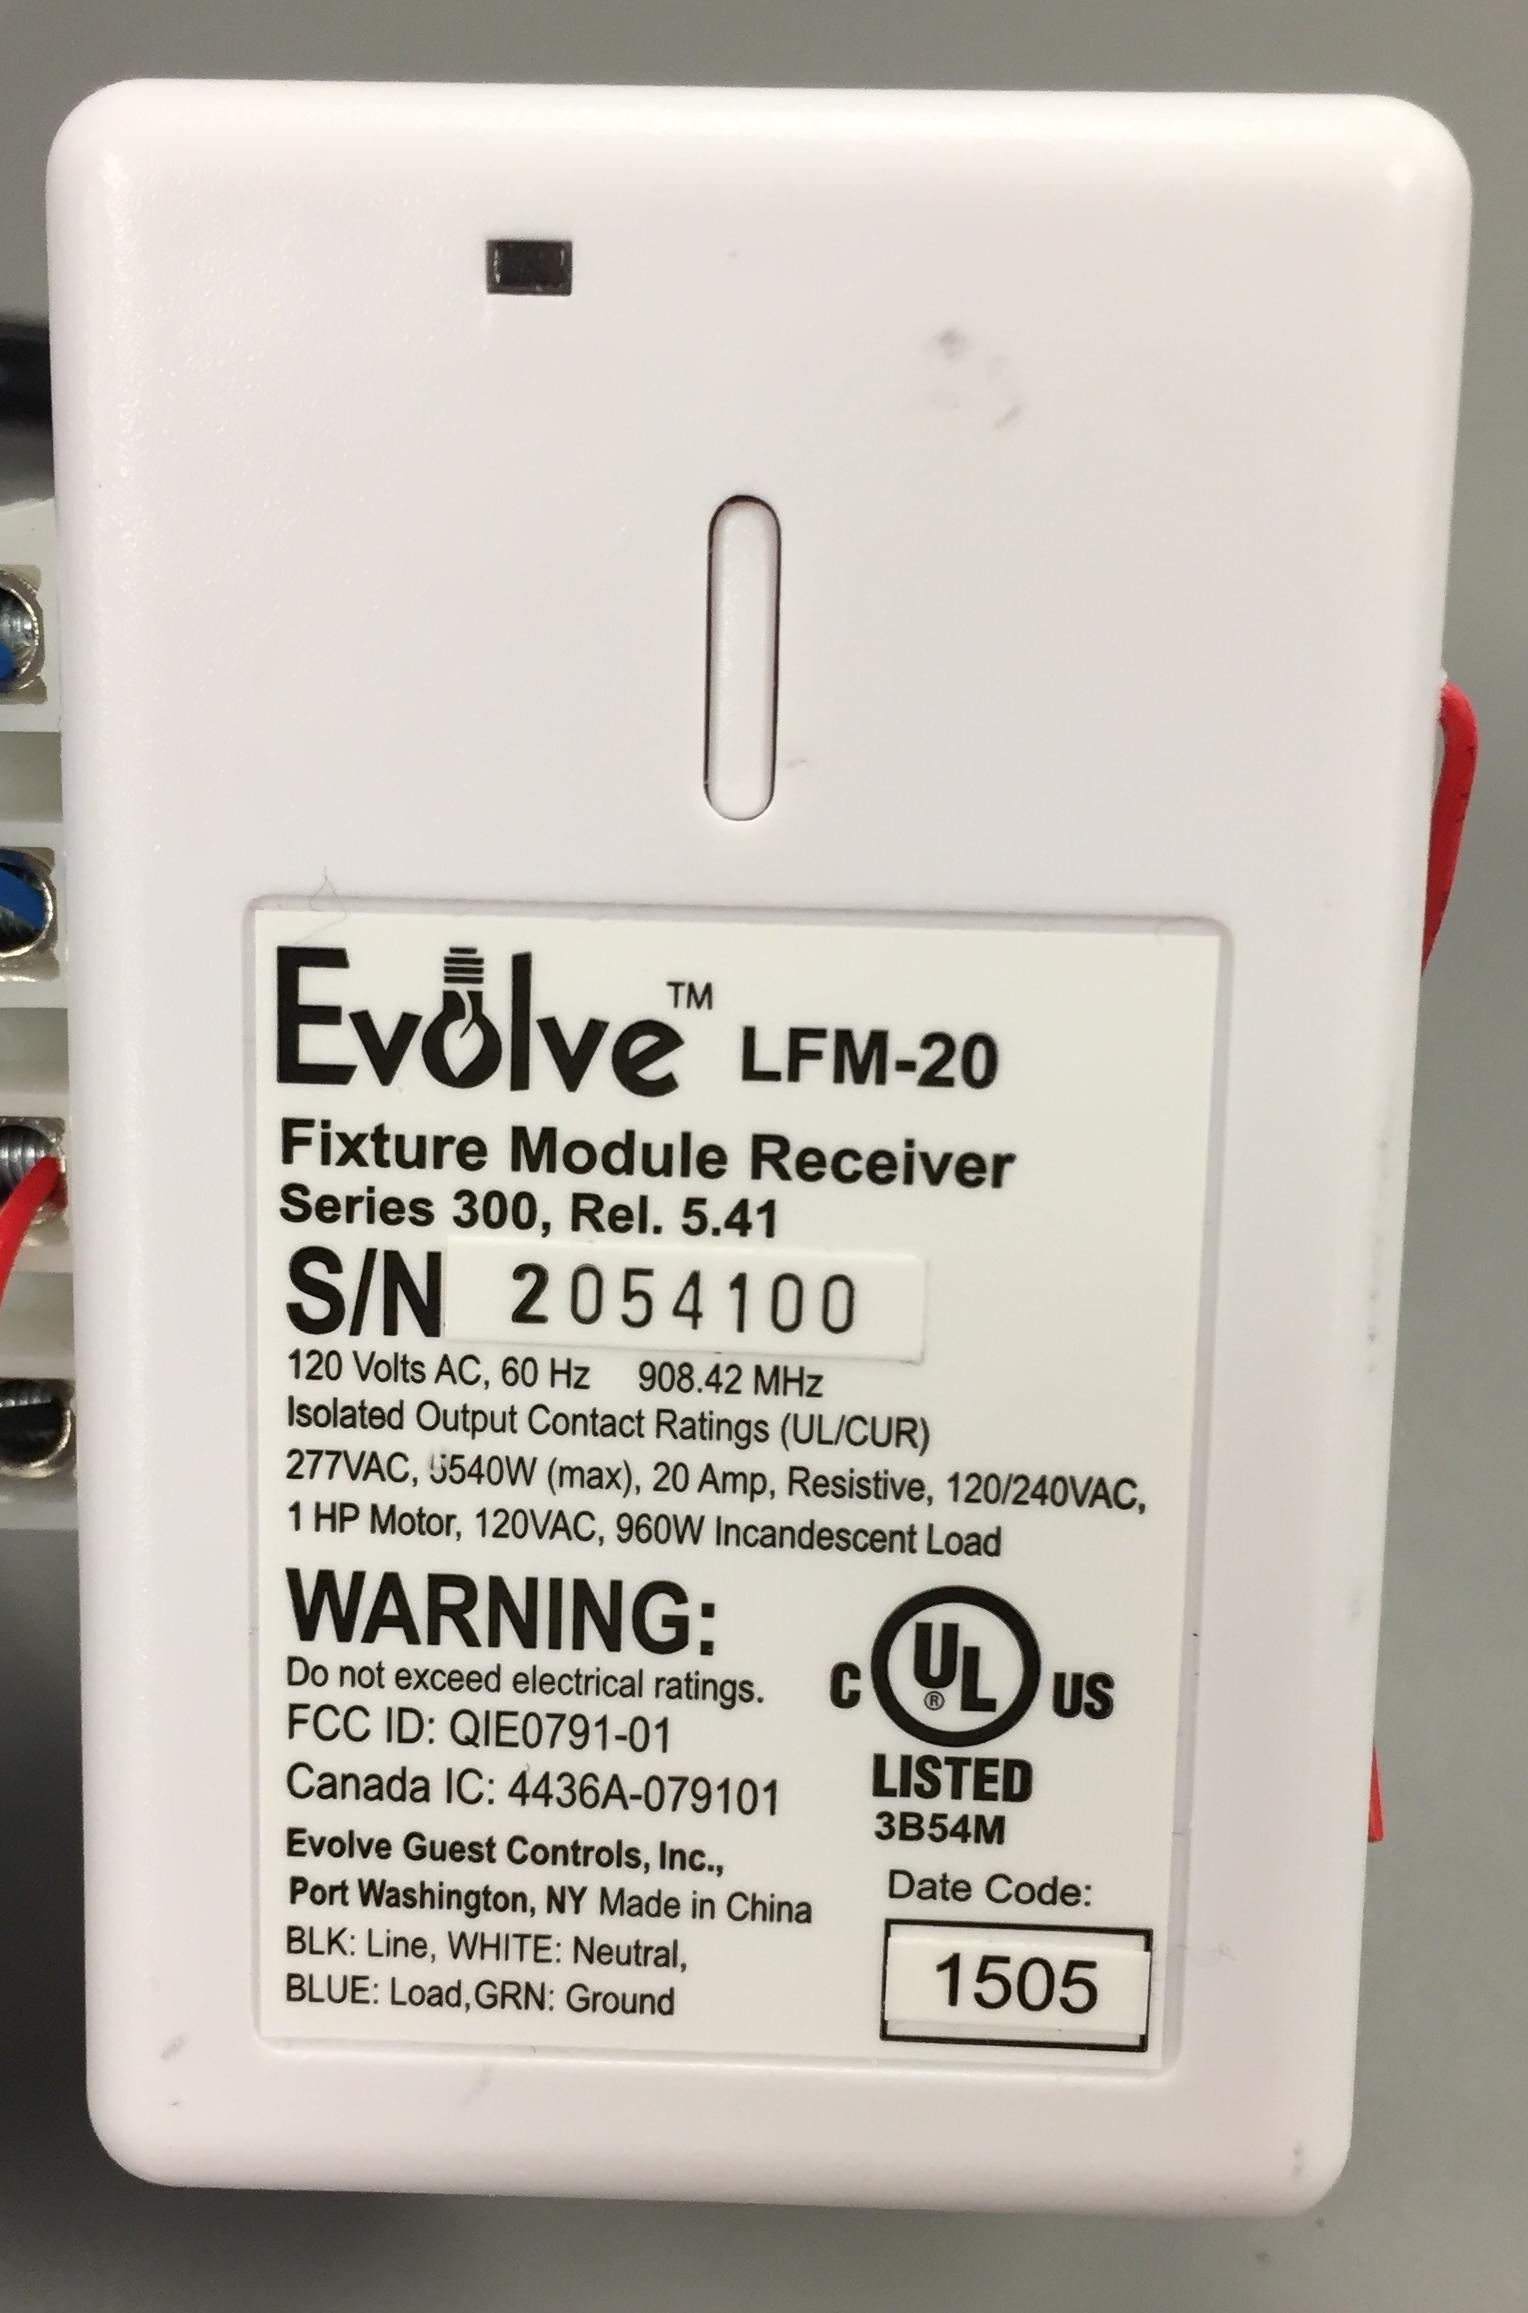 Evolve LFM-20 dry switch. See it on Amazon.